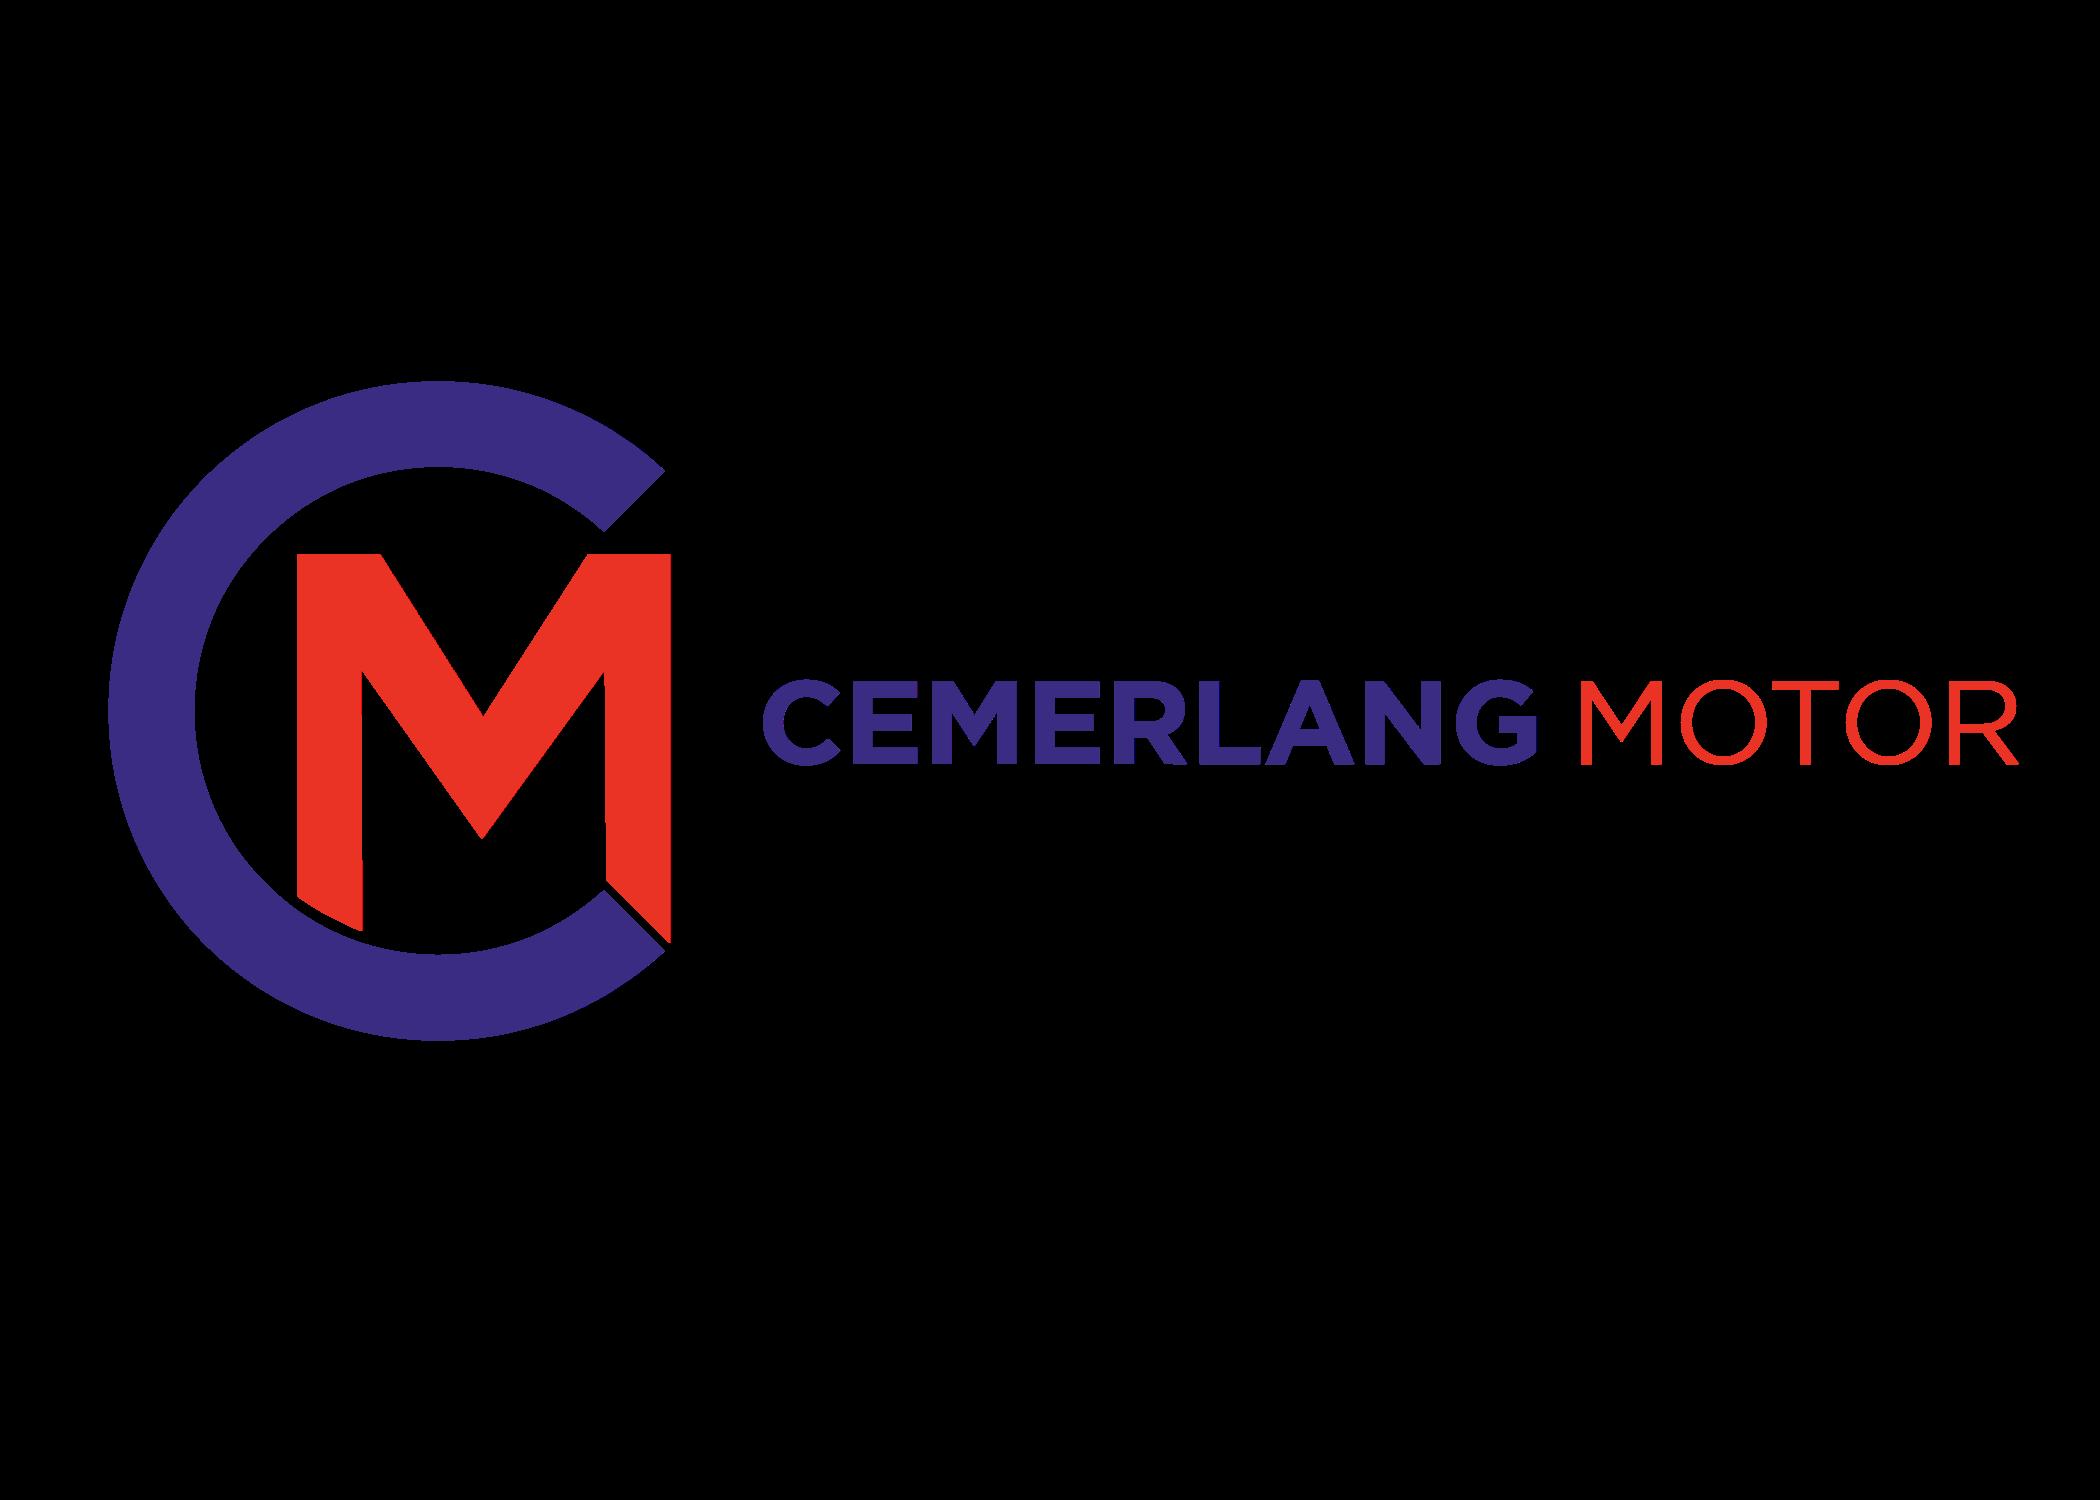 Logo Cemerlang Motor